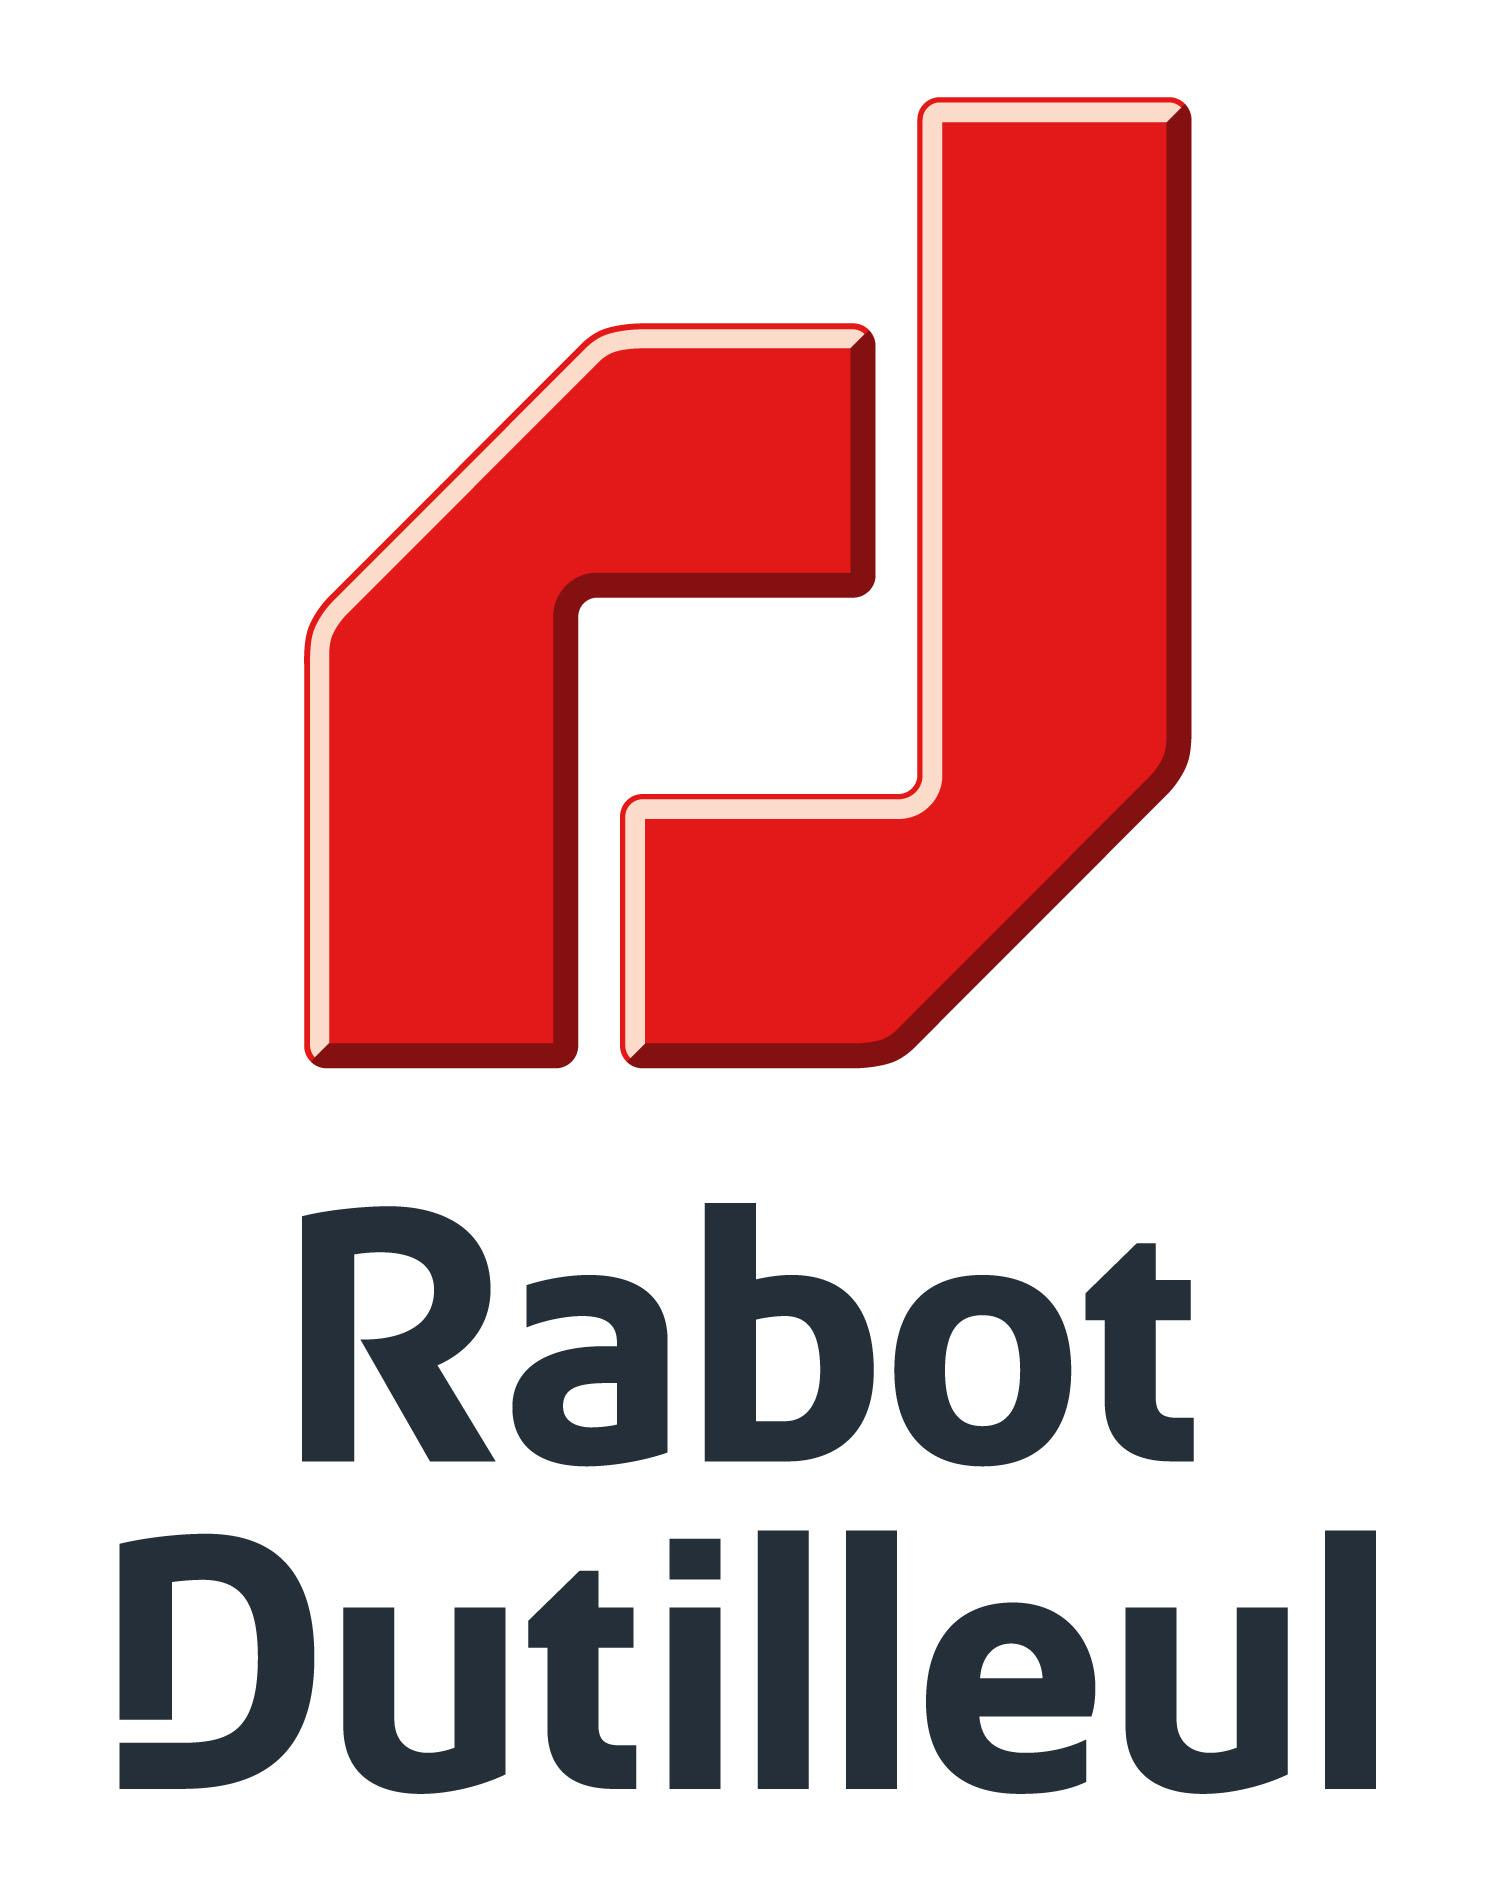 Rabot-Dutilleul.jpg